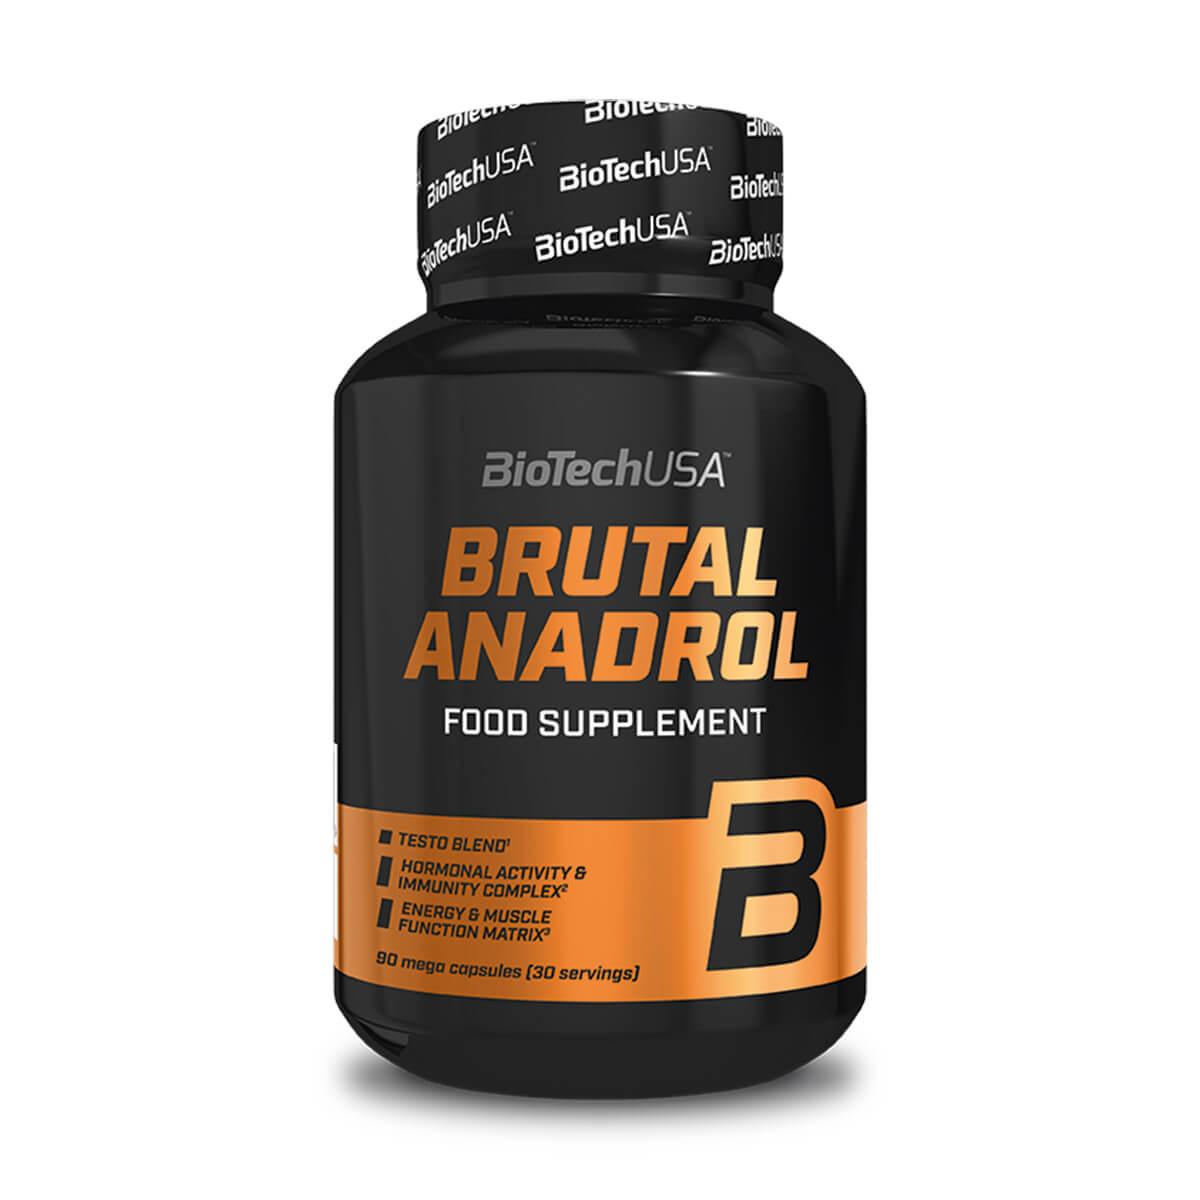 Köp Brutal Anadrol, 90 kapslar, BioTech online hos